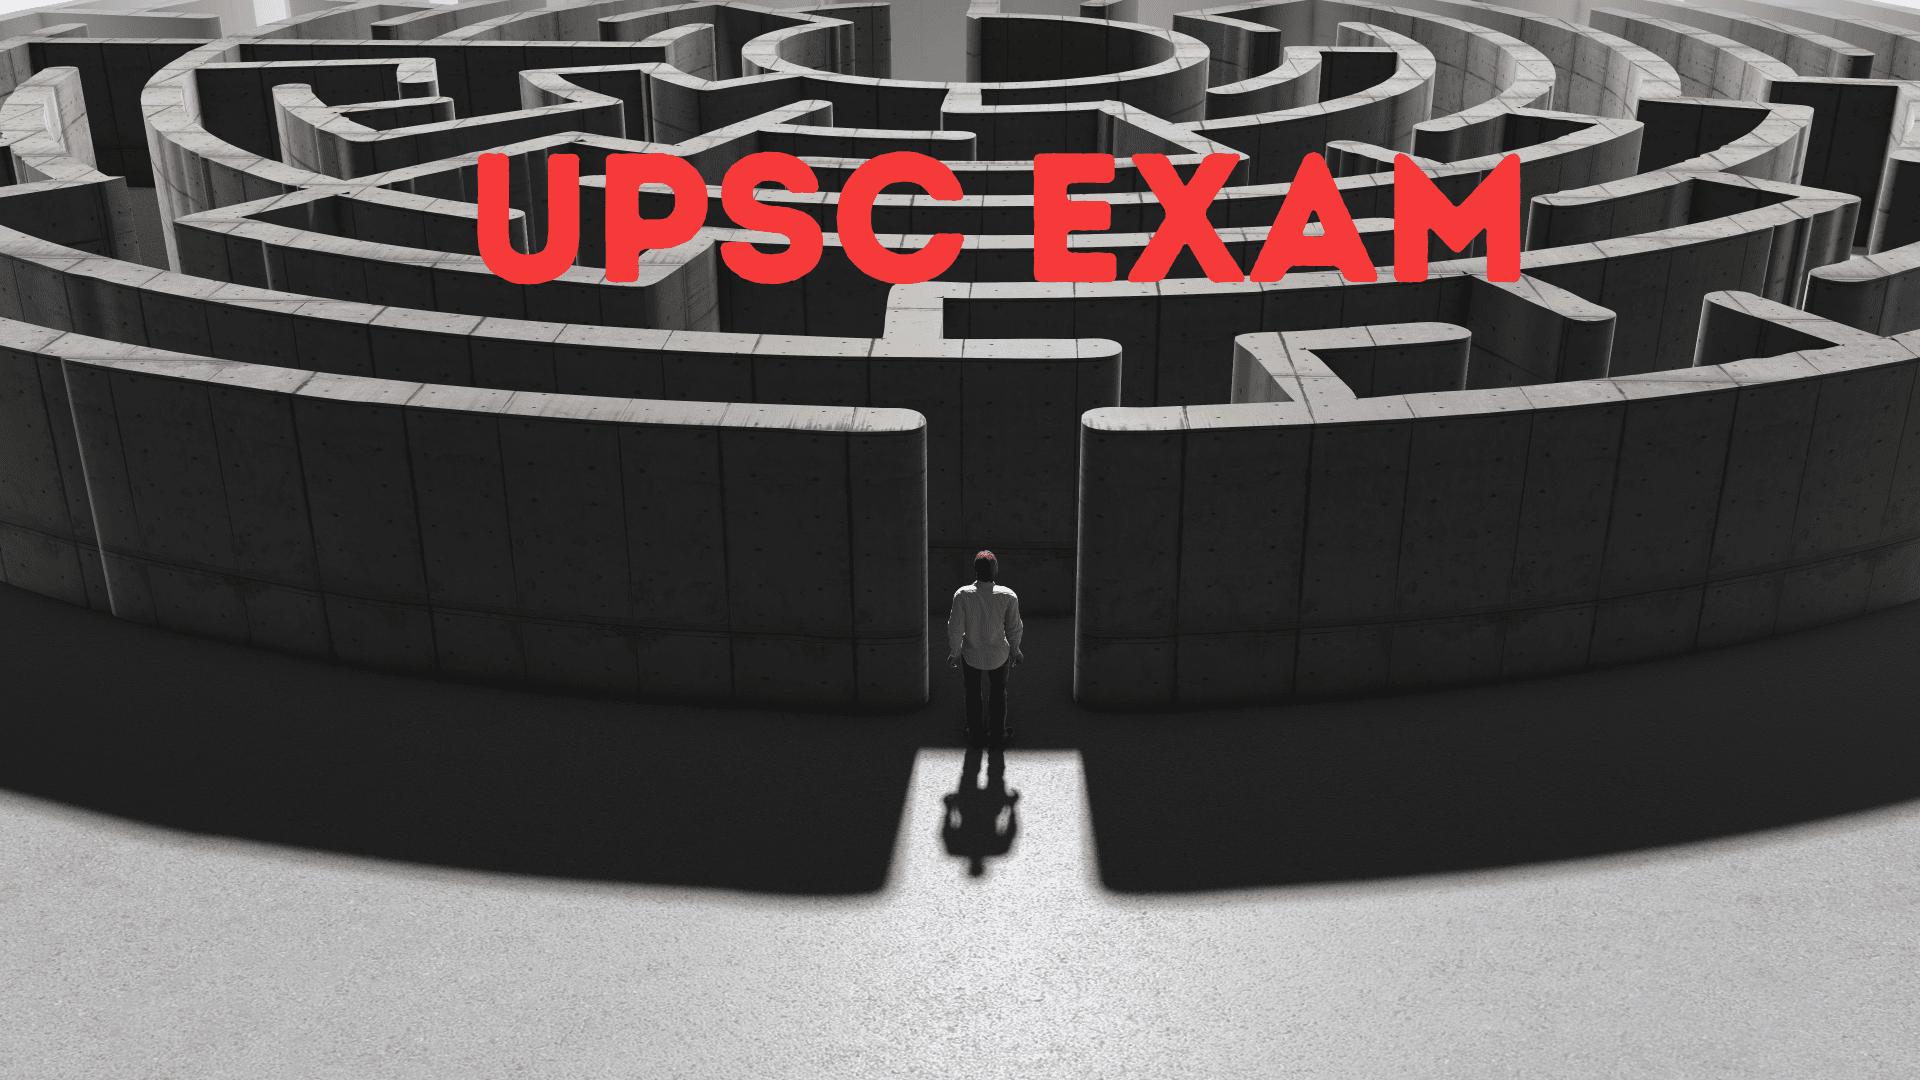 ADVICE ON UPSC PREPARATION